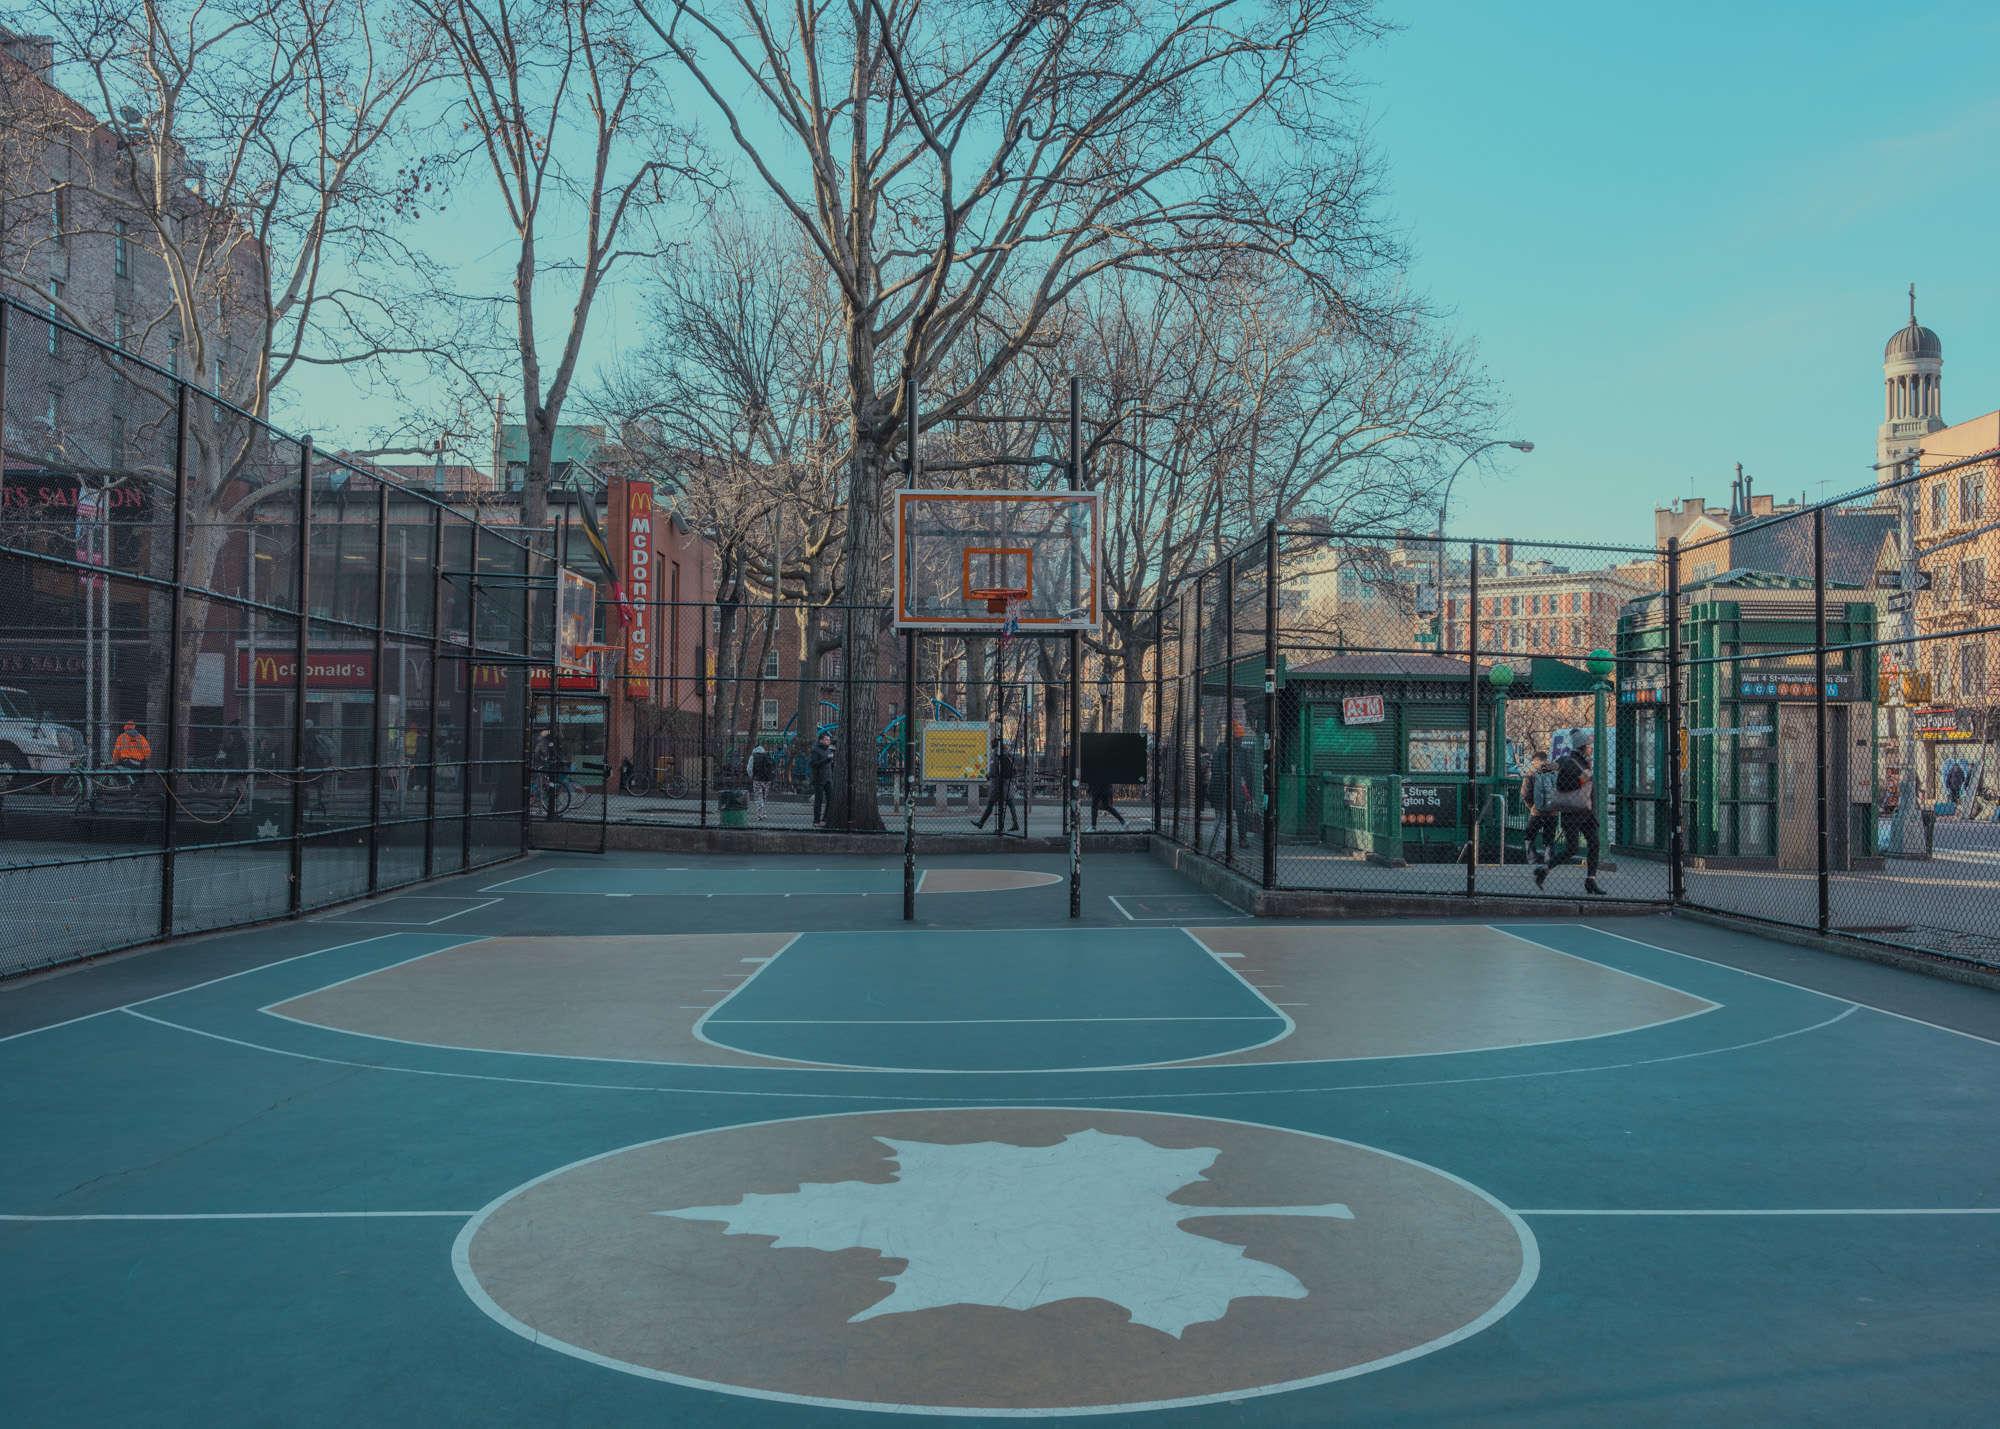 Ludwig Favre - NYC Playground